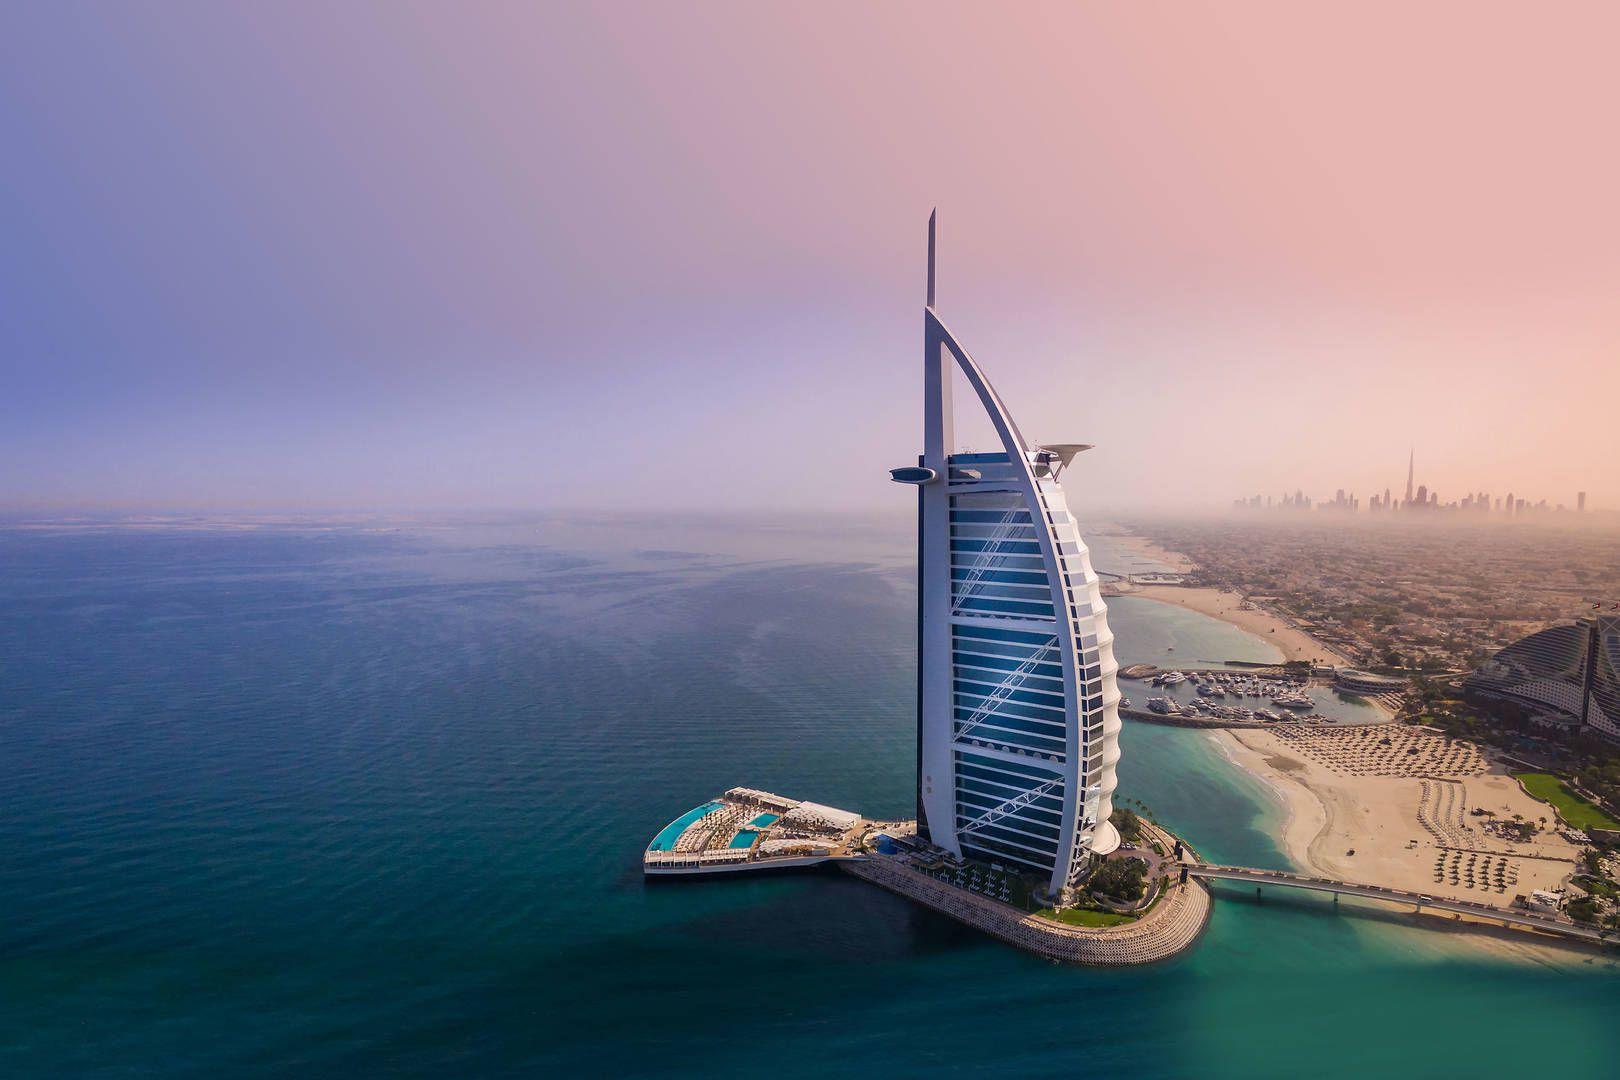 view of the sail shaped Burj Al Arab hotel on the dubai coastline